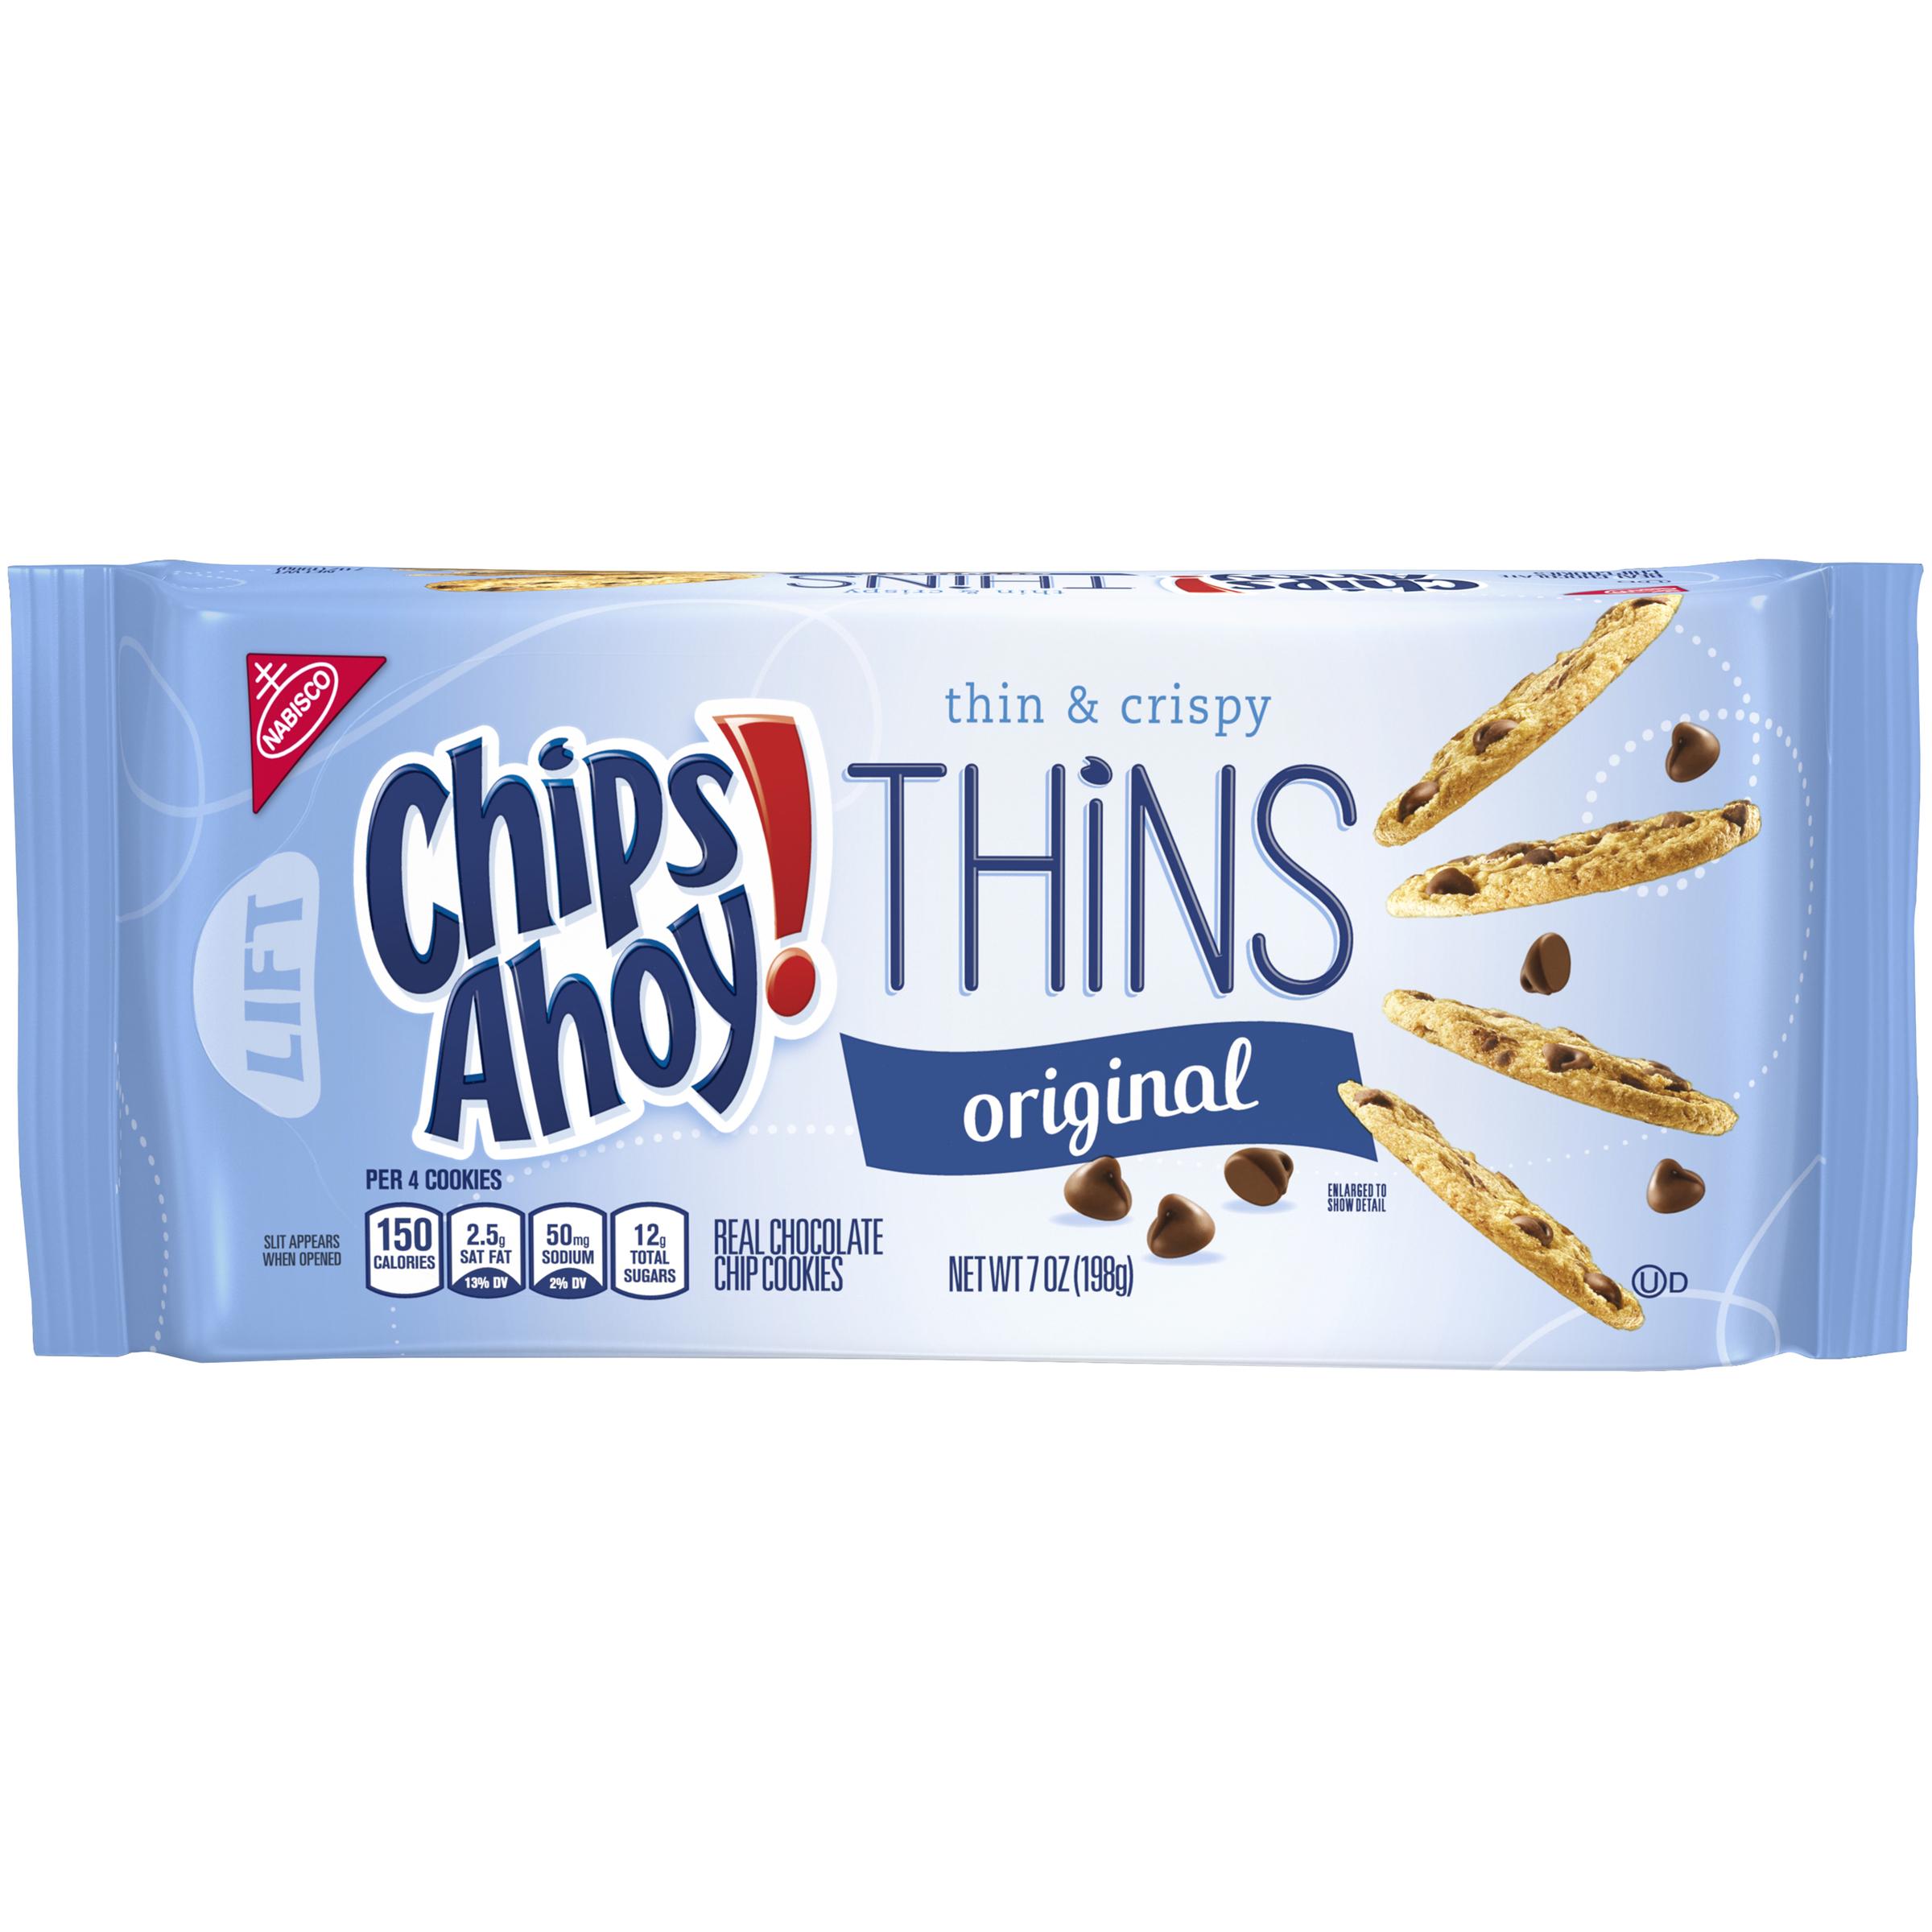 CHIPS AHOY! Thins Original Cookies 7 oz